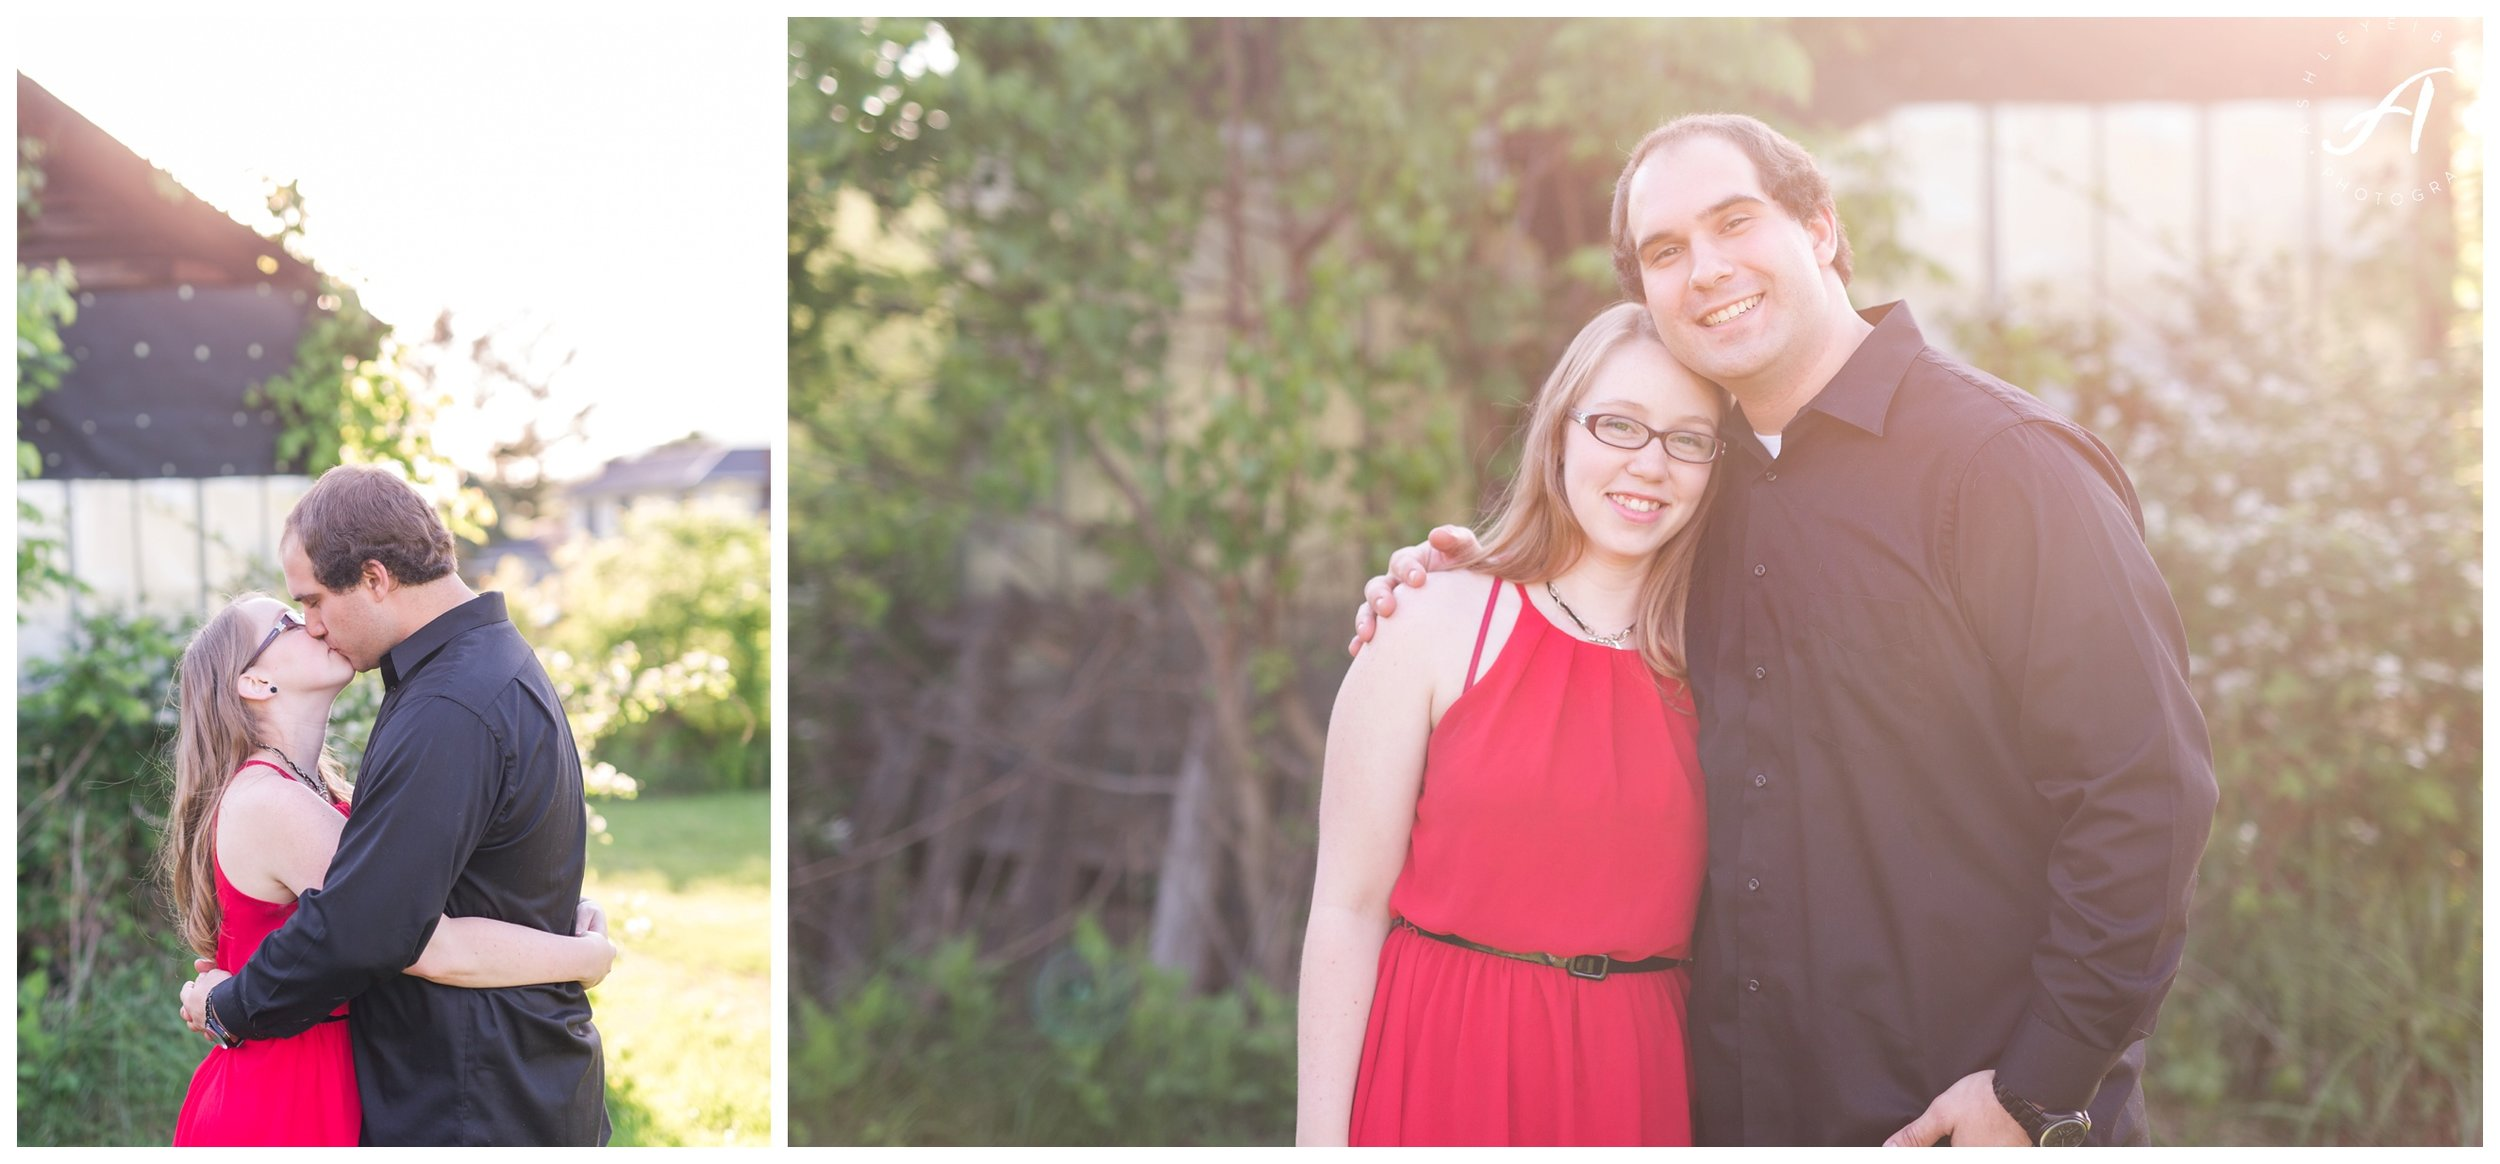 Bedford Virginia Engagement Session    Mountain view engagement session    Ashley Eiban Photography    www.ashleyeiban.com